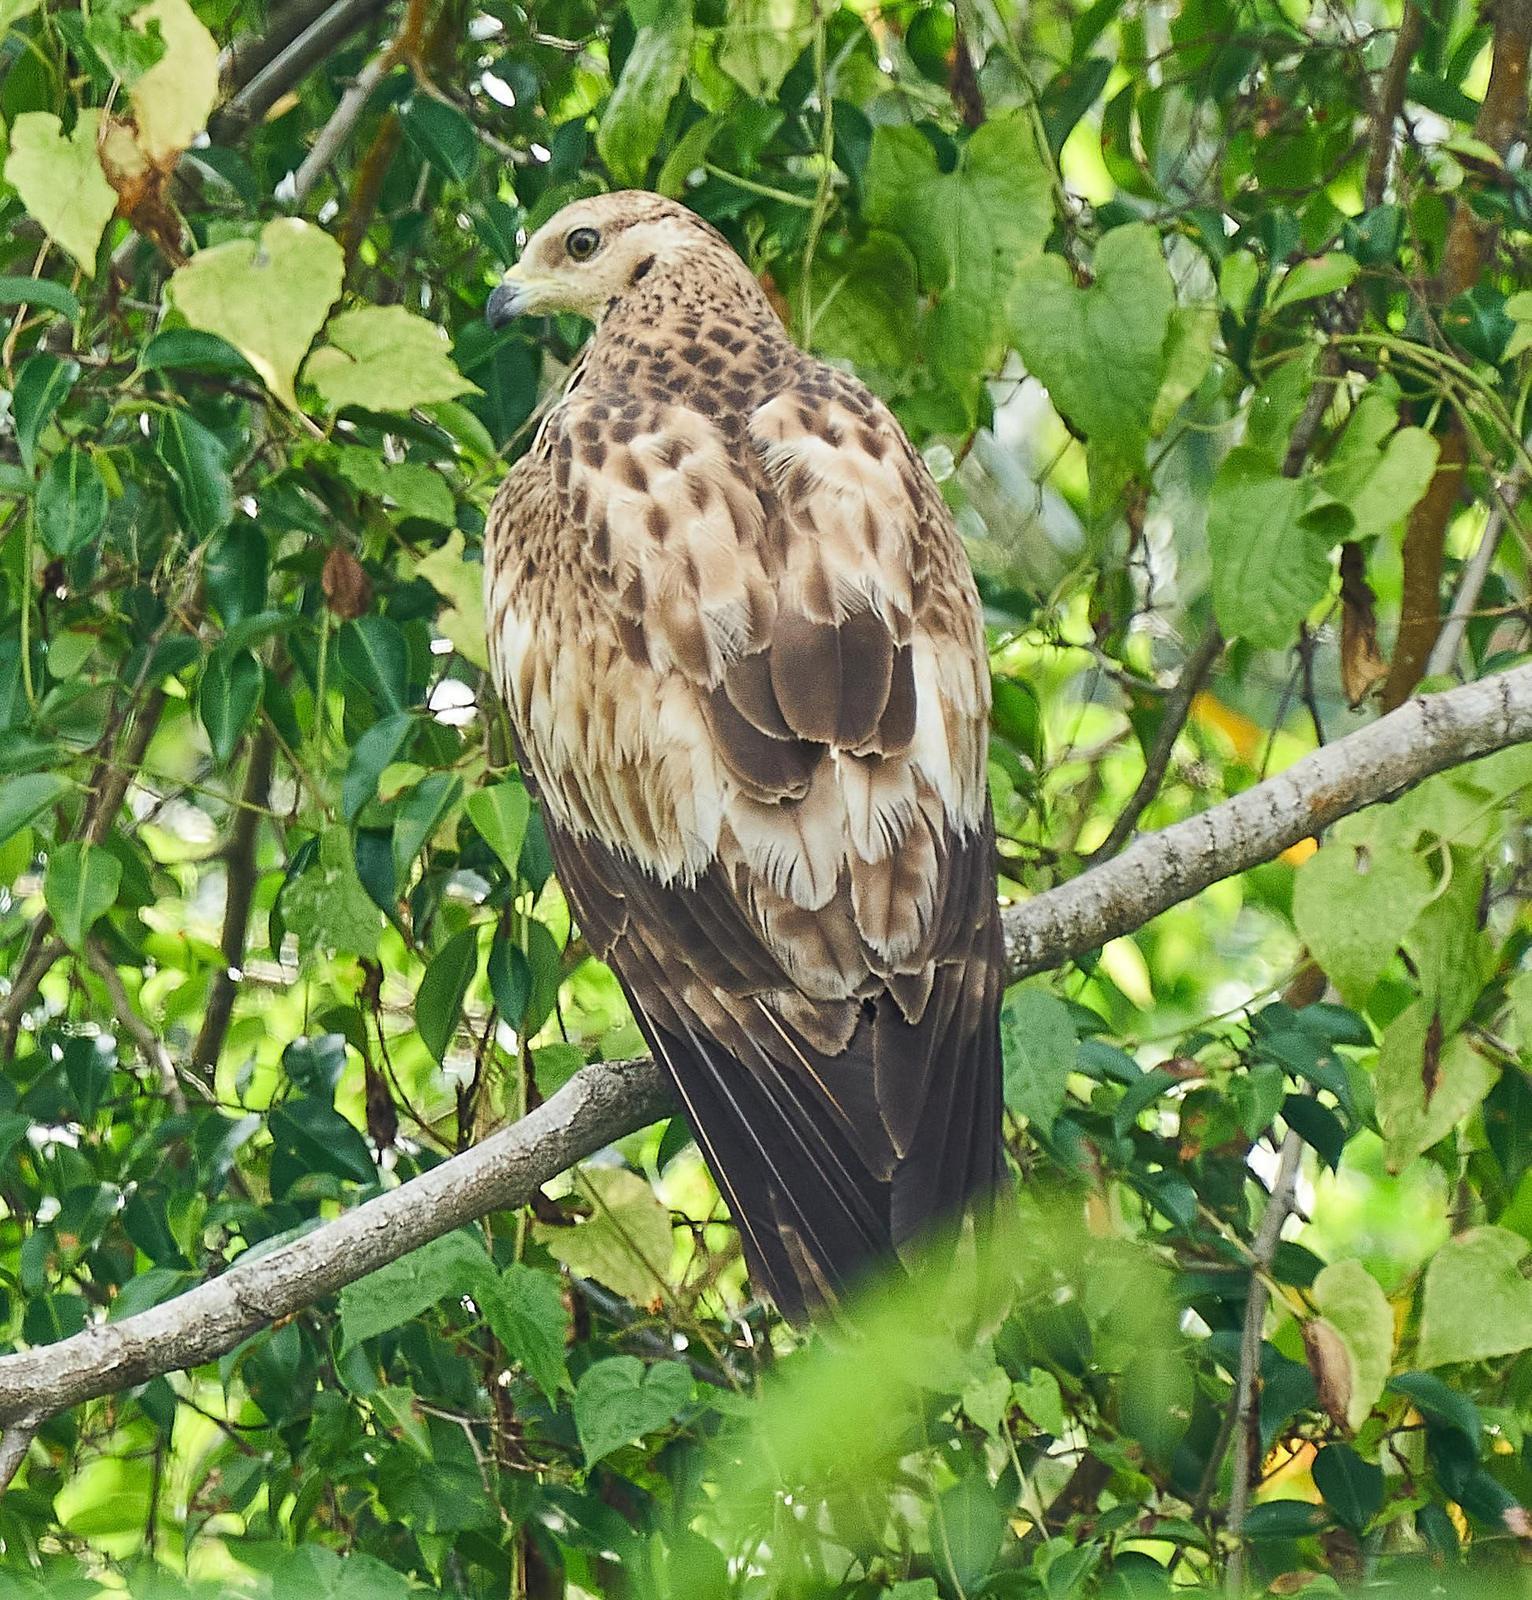 Oriental Honey-buzzard Photo by Steven Cheong